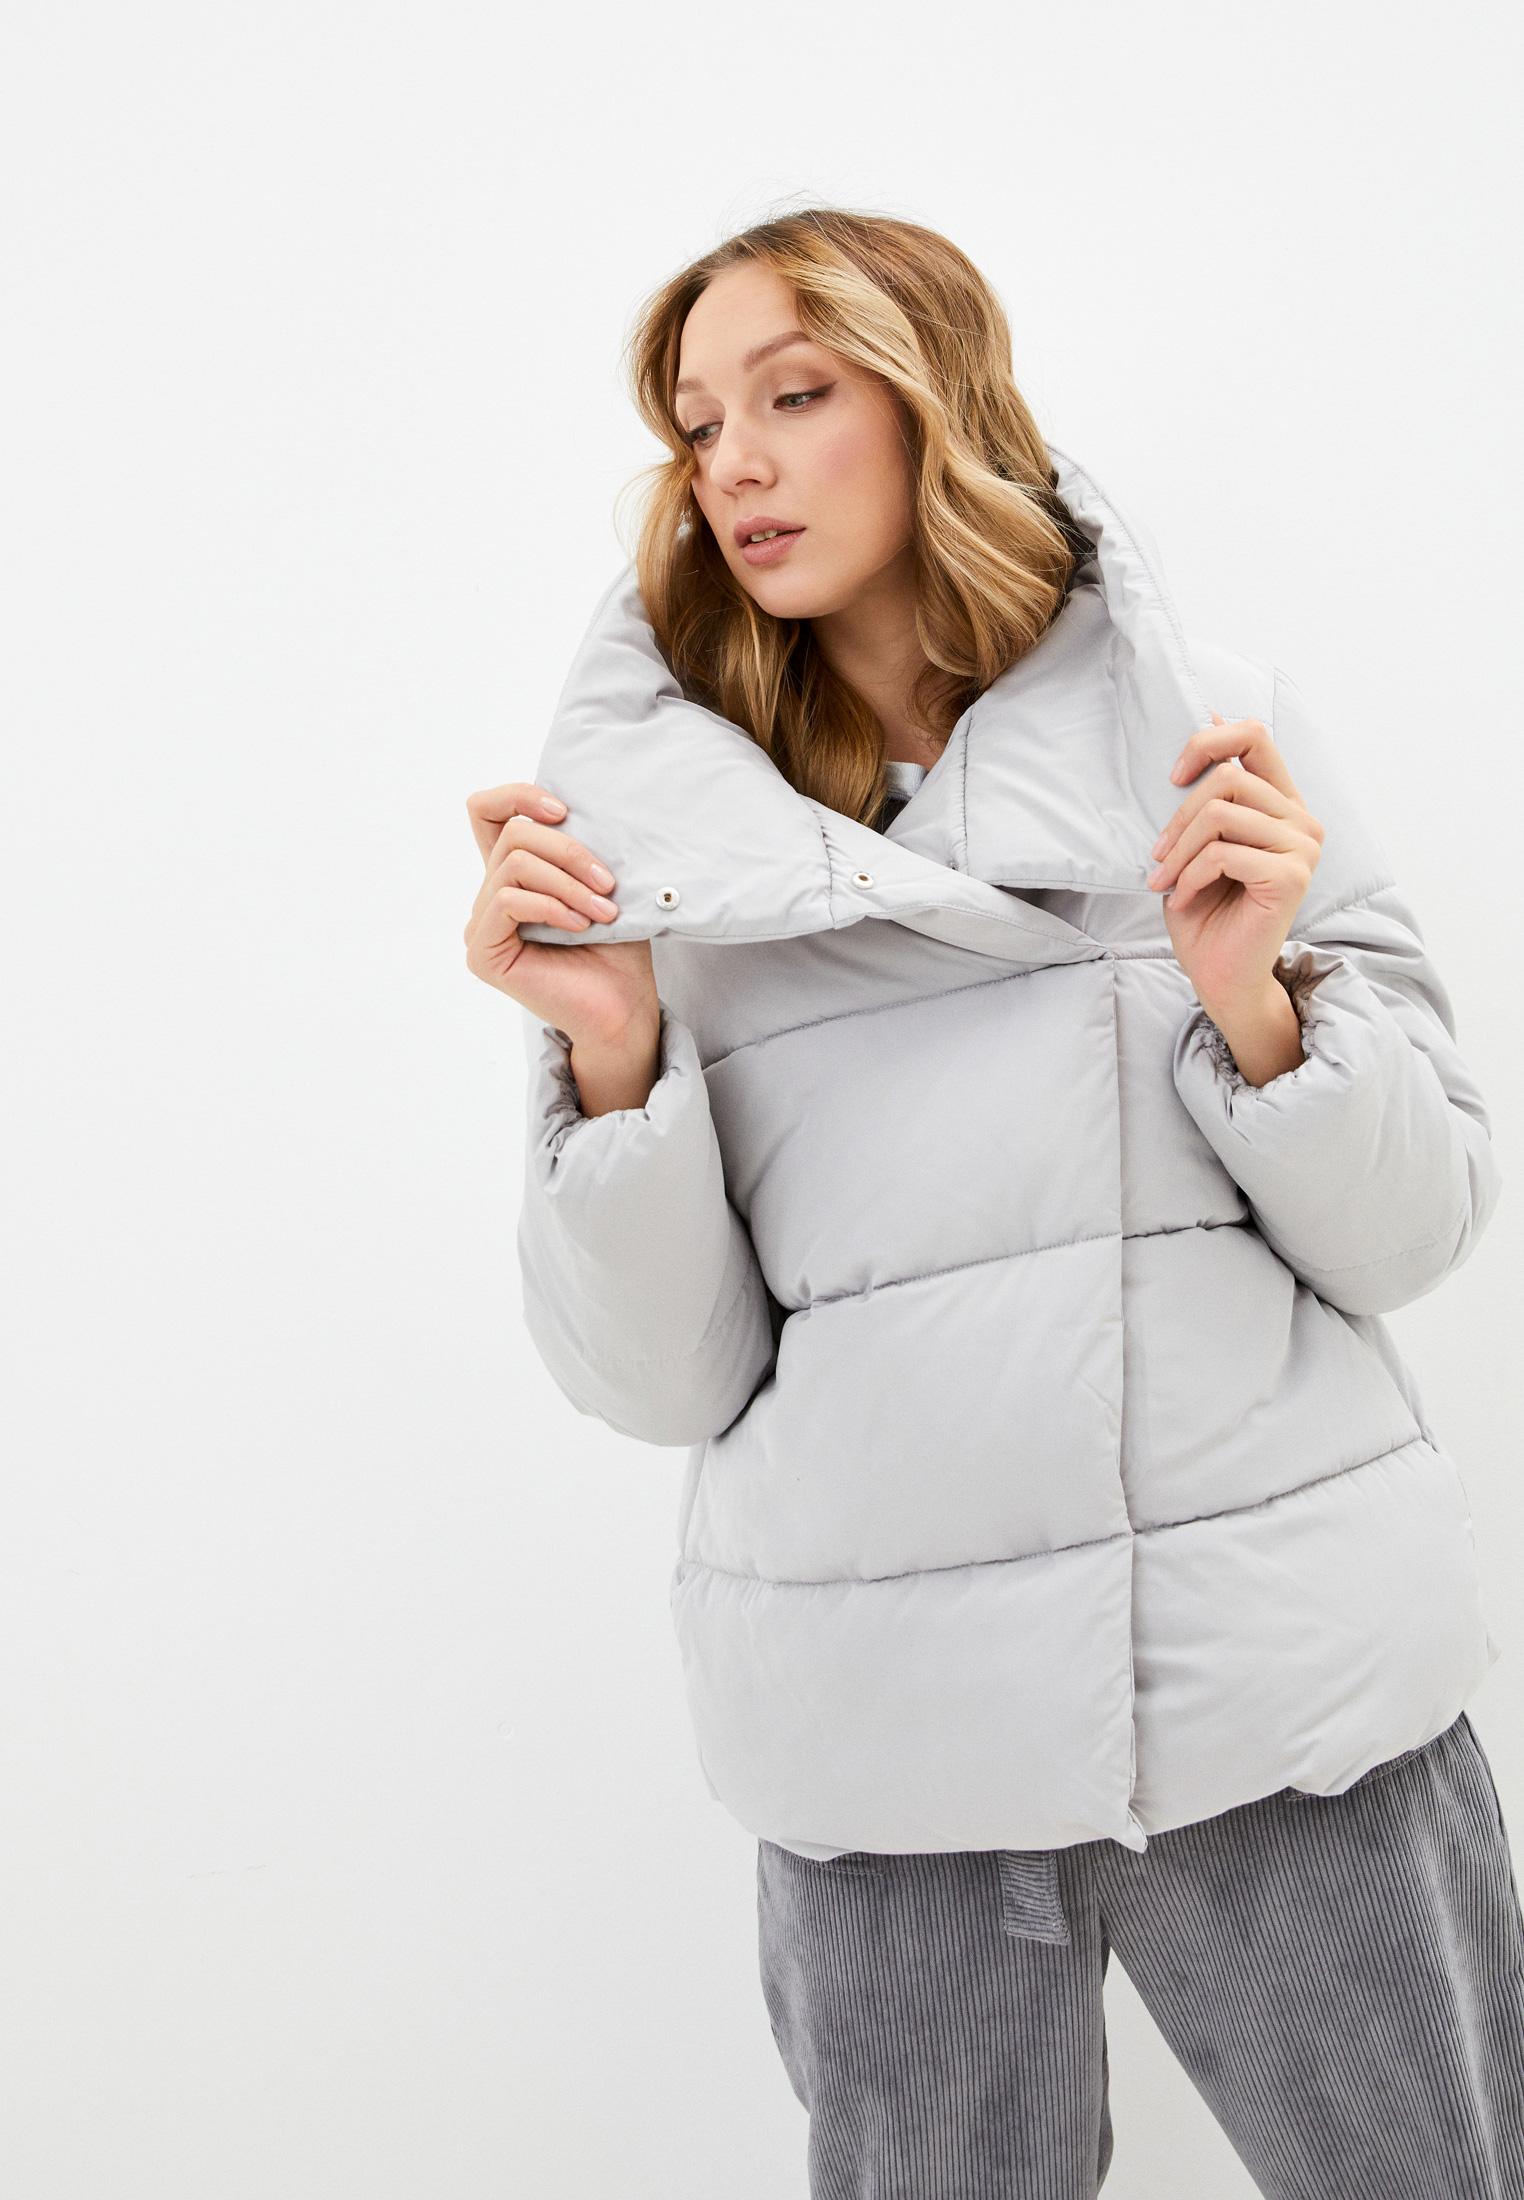 Куртка утепленная Zarina купить за 144.00 р. в интернет-магазине Lamoda.by